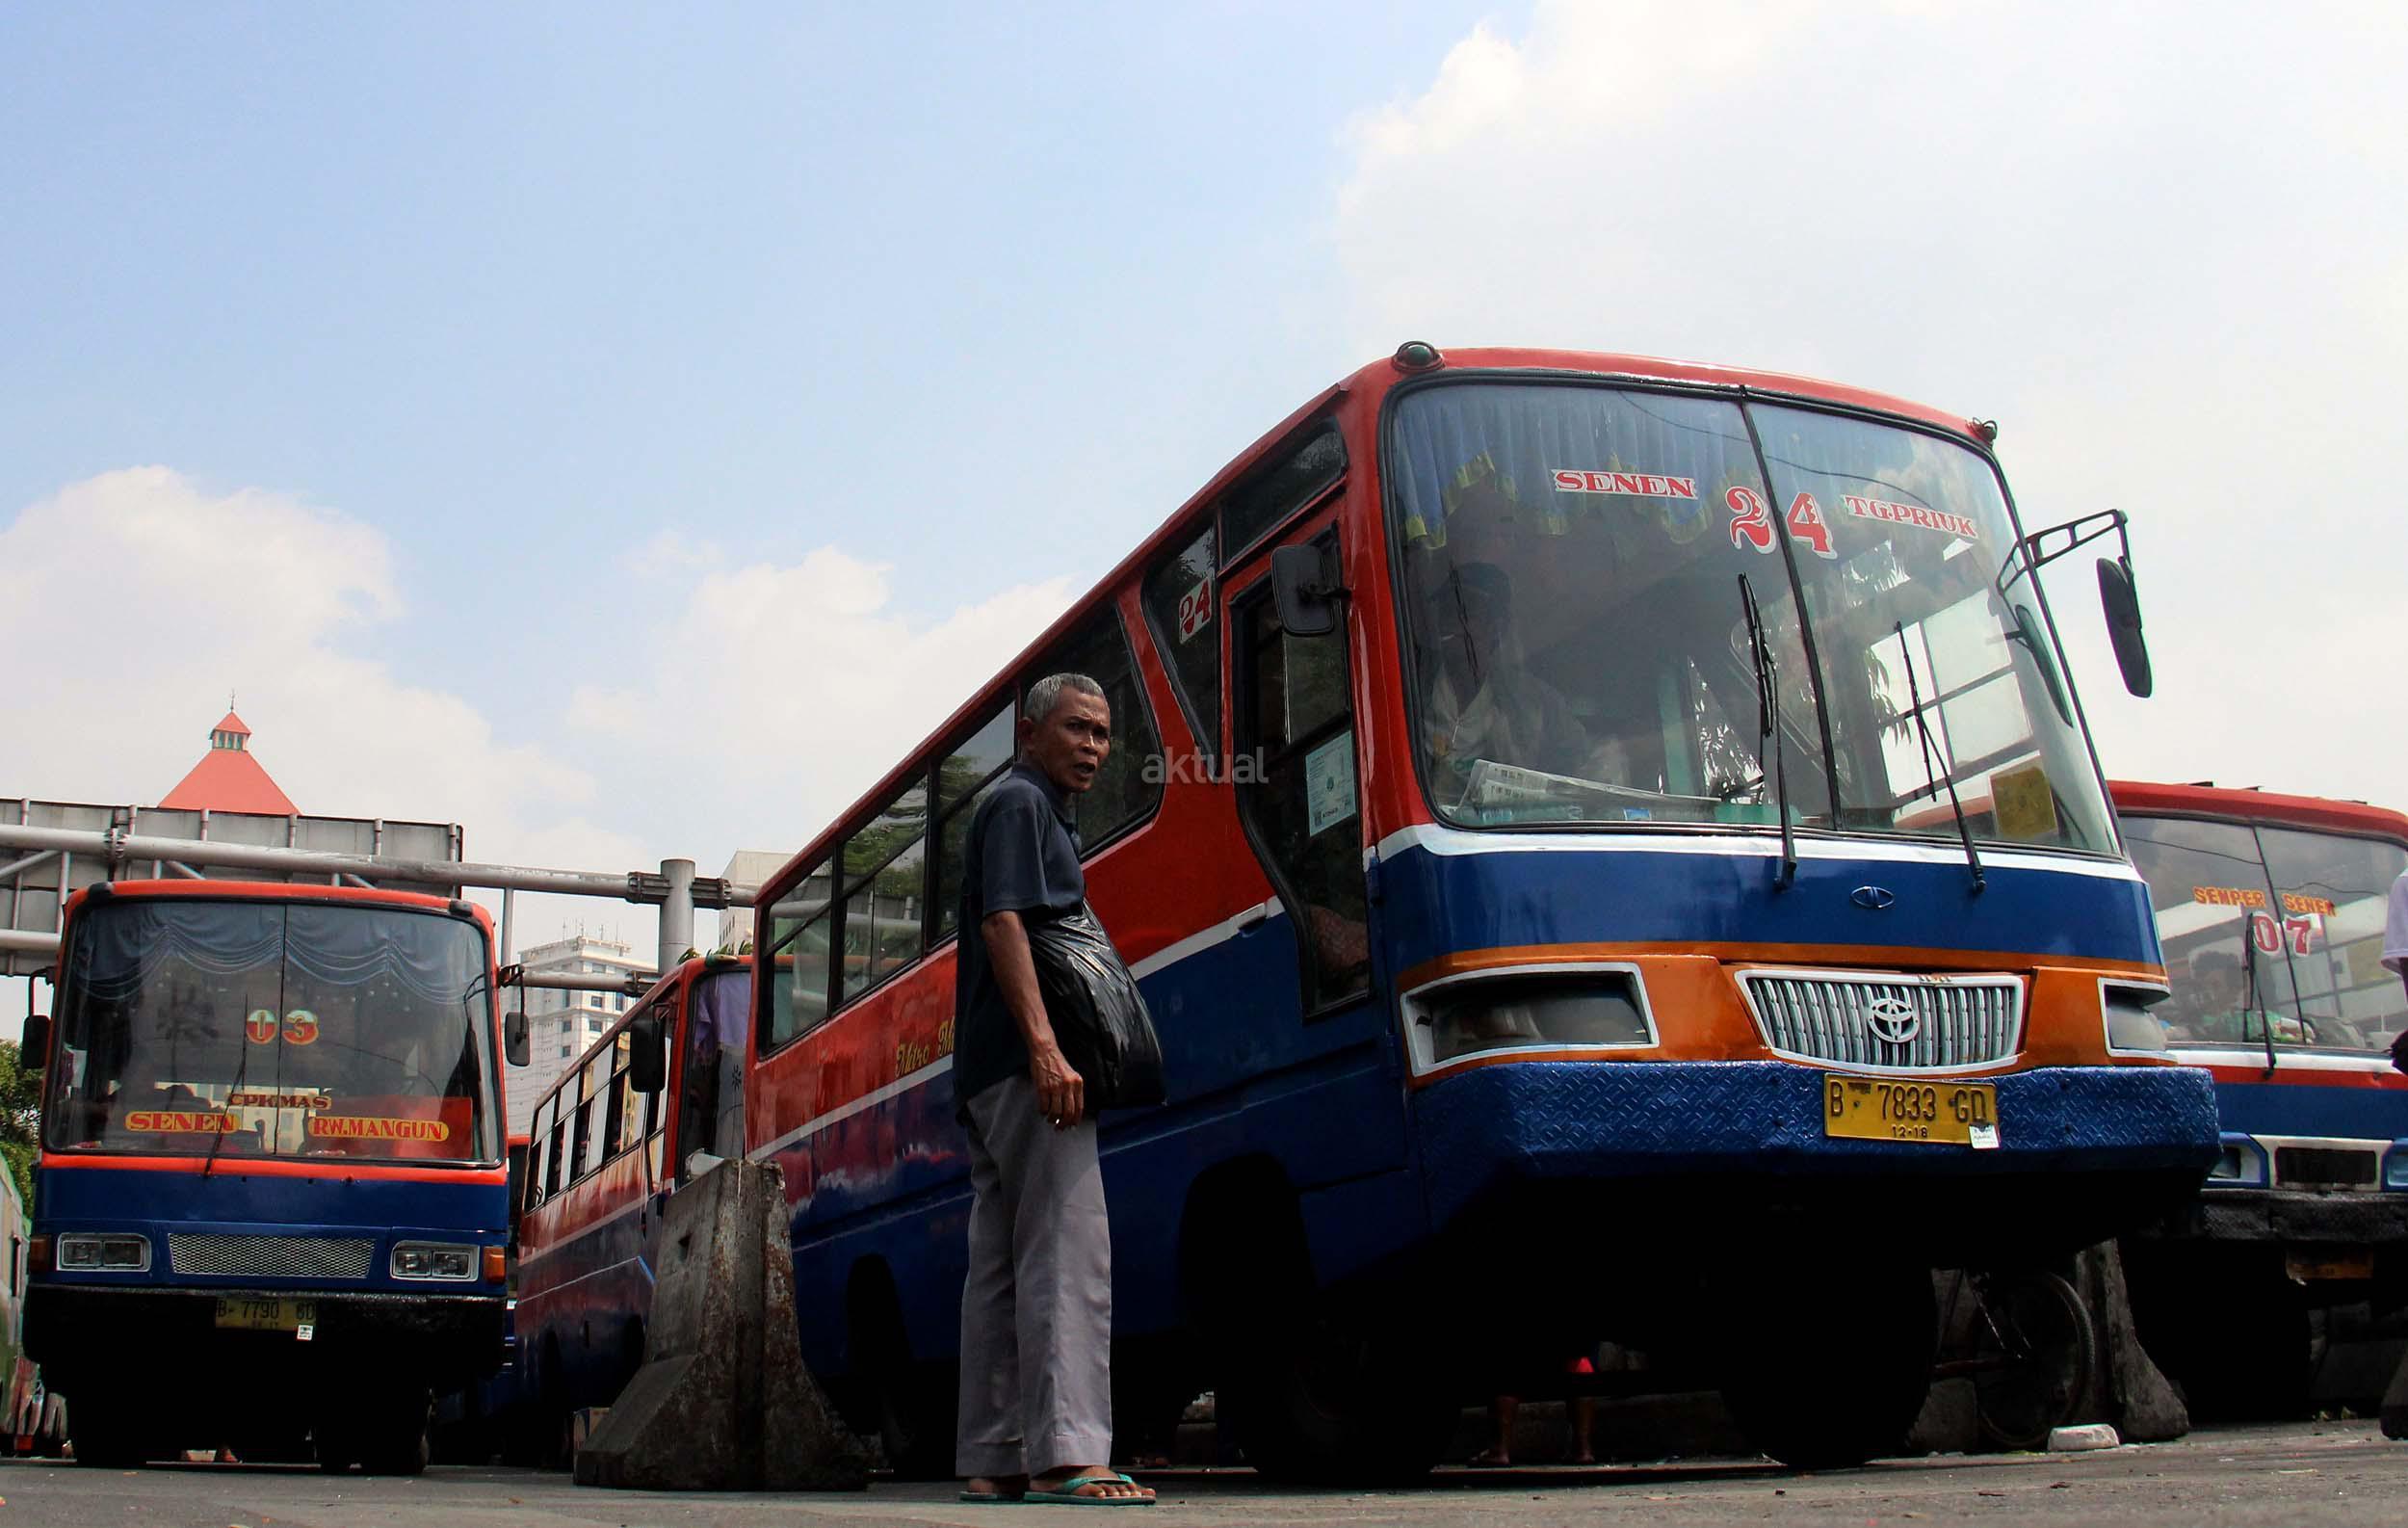 Ini Trayek Metromini di Jakarta Selatan Yang Mogok Operasi.. - Aktual ...